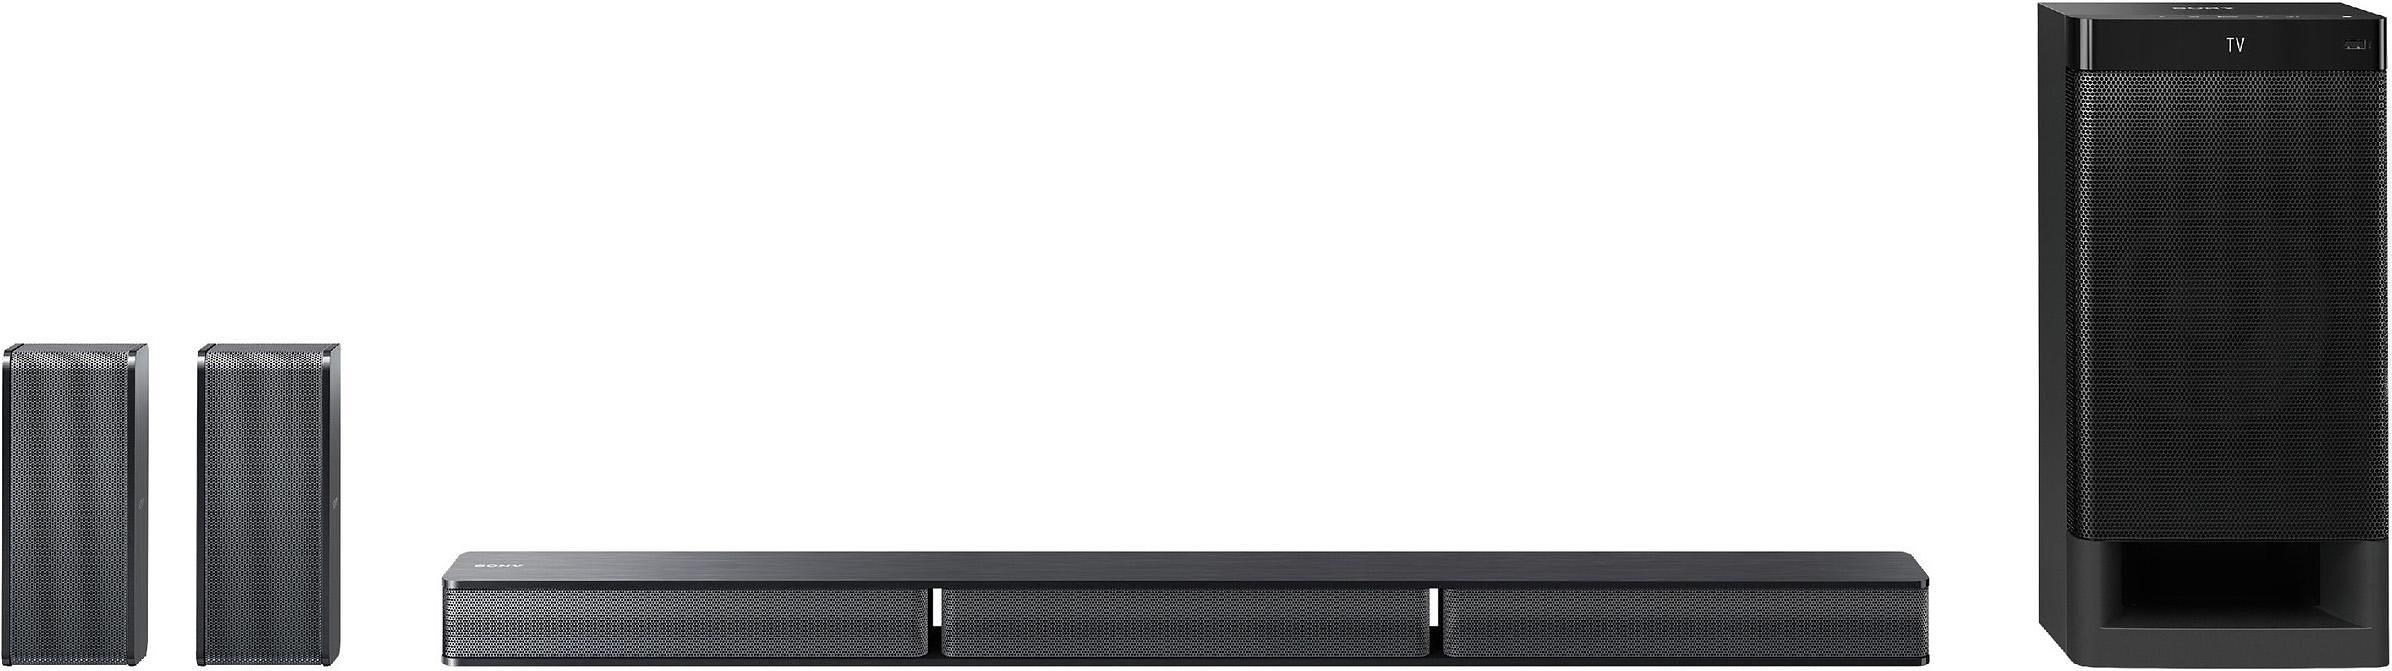 SONY HT-RT3 soundbar, Bluetooth, NFC, USB in de webshop van OTTO kopen